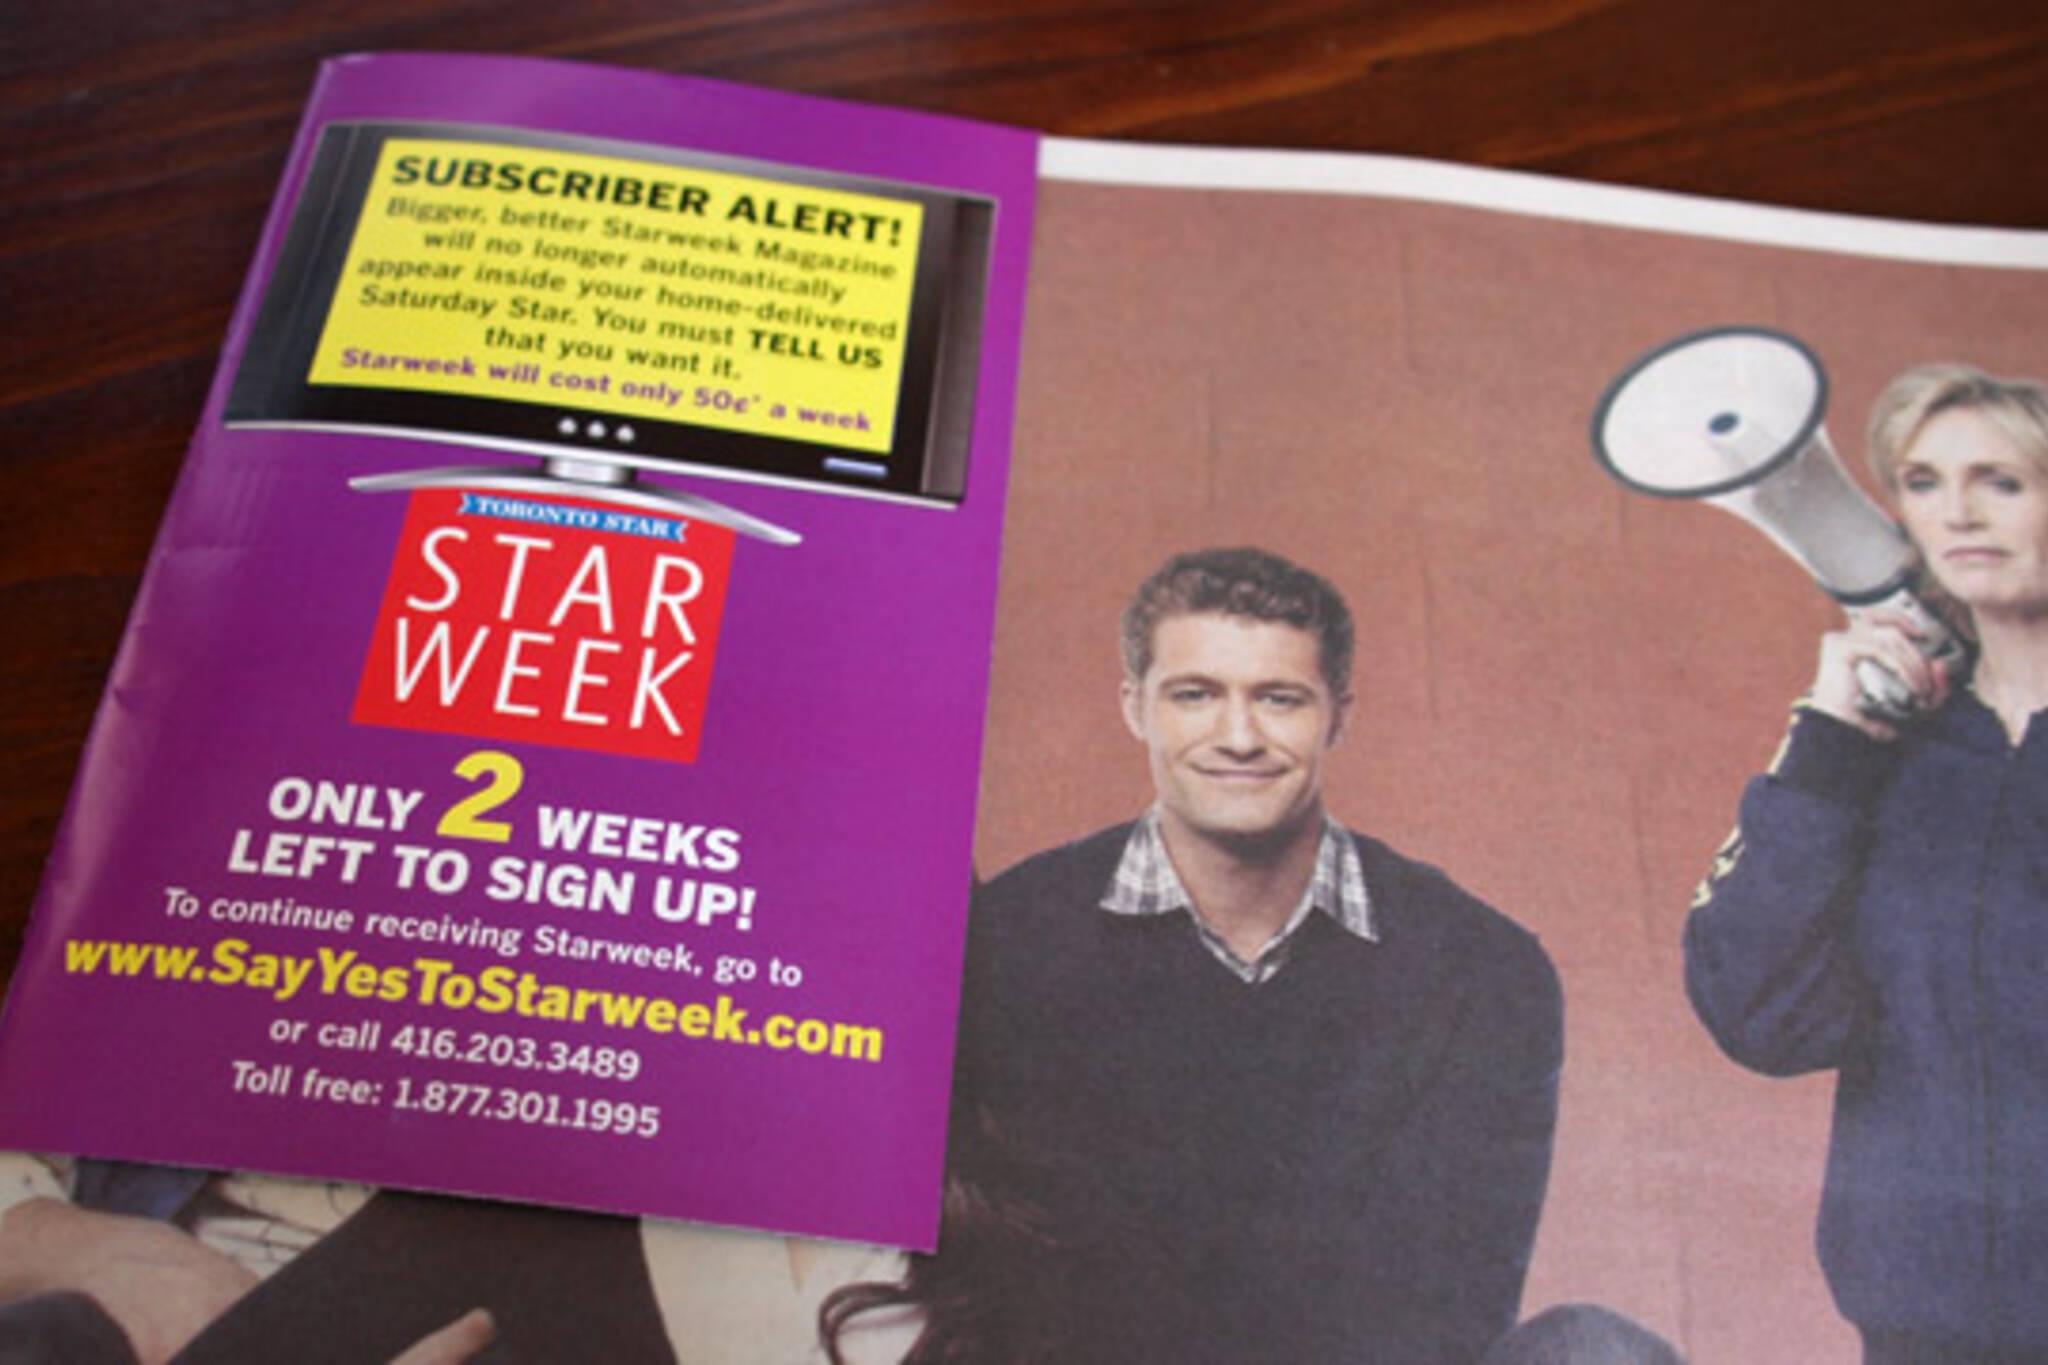 starweek toronto star